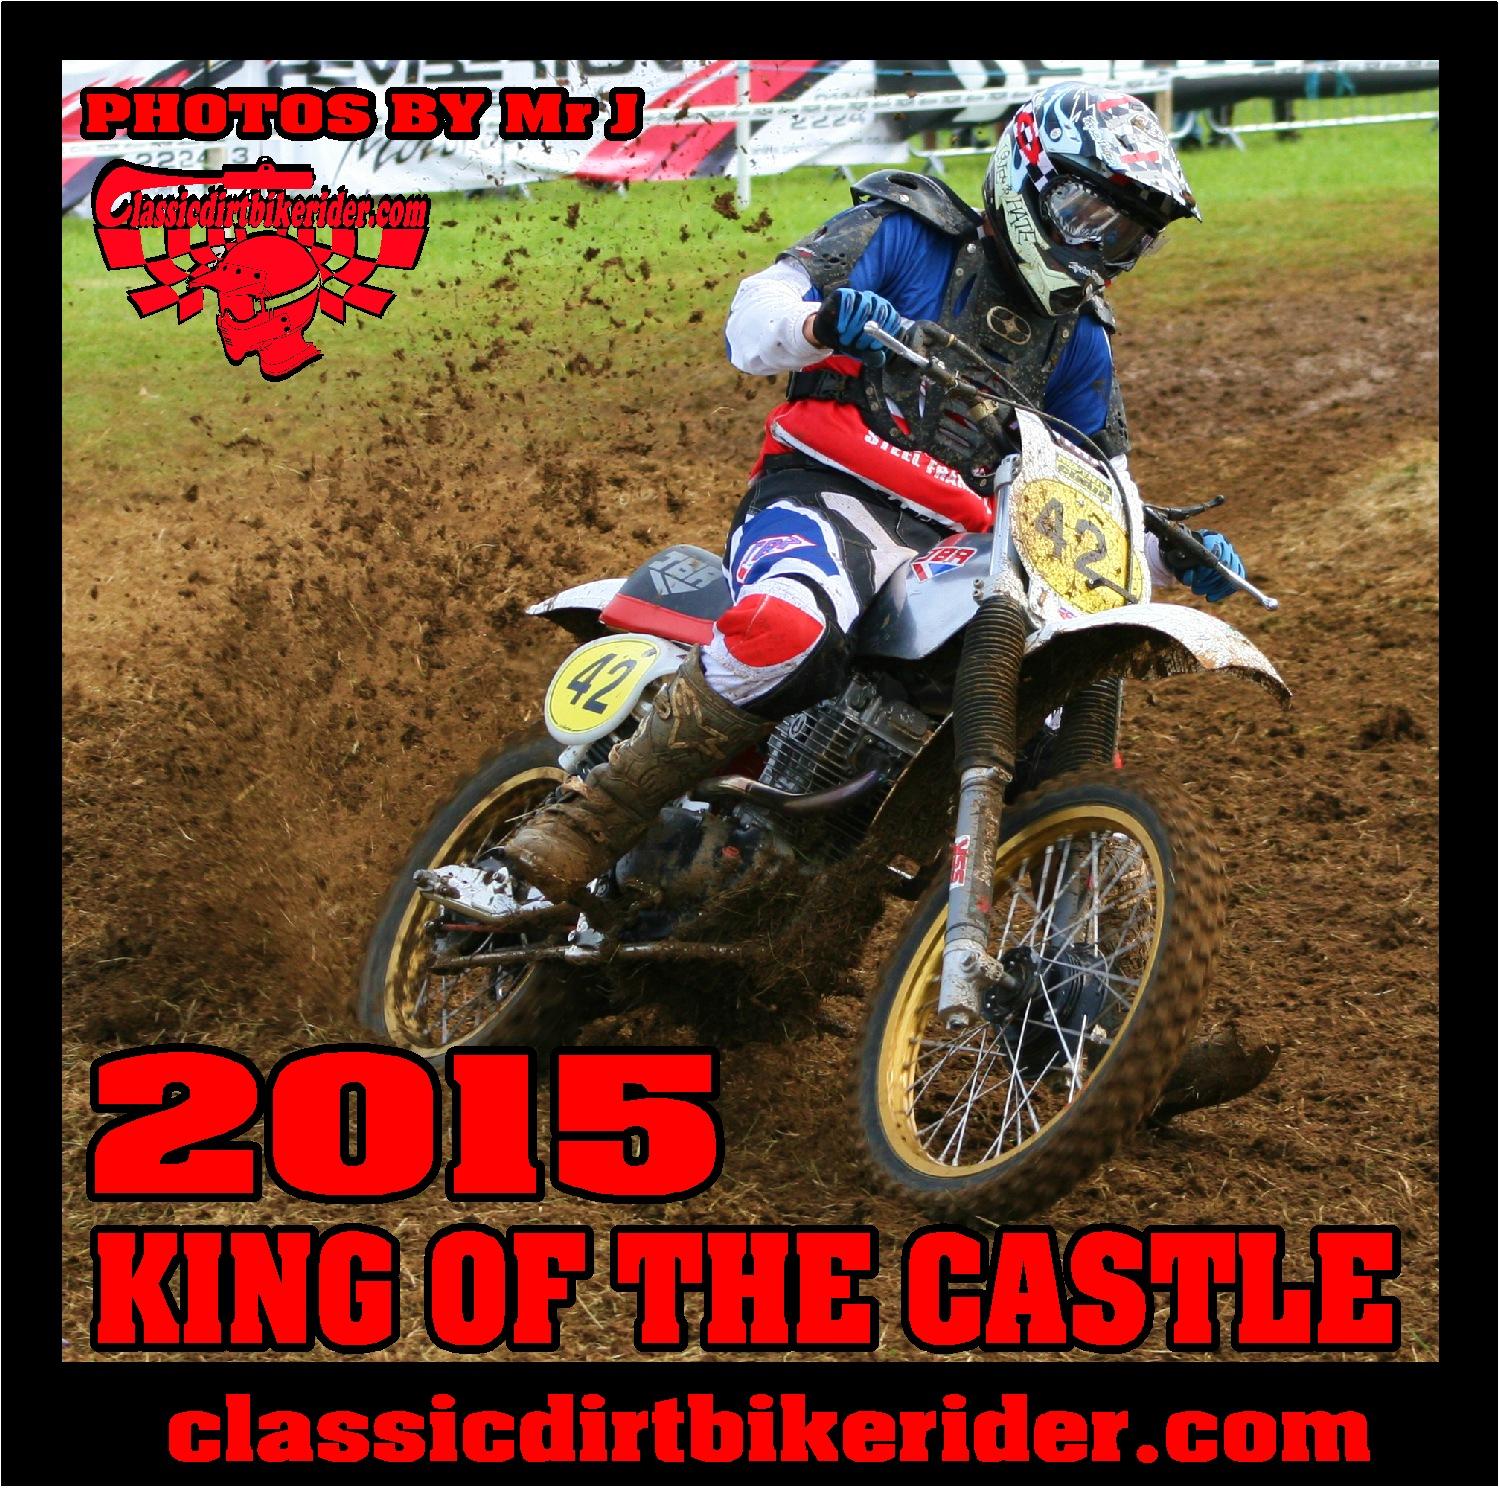 2015 KING OF THE CASTLE PHOTOS images classicdirtbikerider.com maico Honda Husqvarna Suzuki Yamaha ccm ksi thumper kawasaki vintage twinshock motocross..1